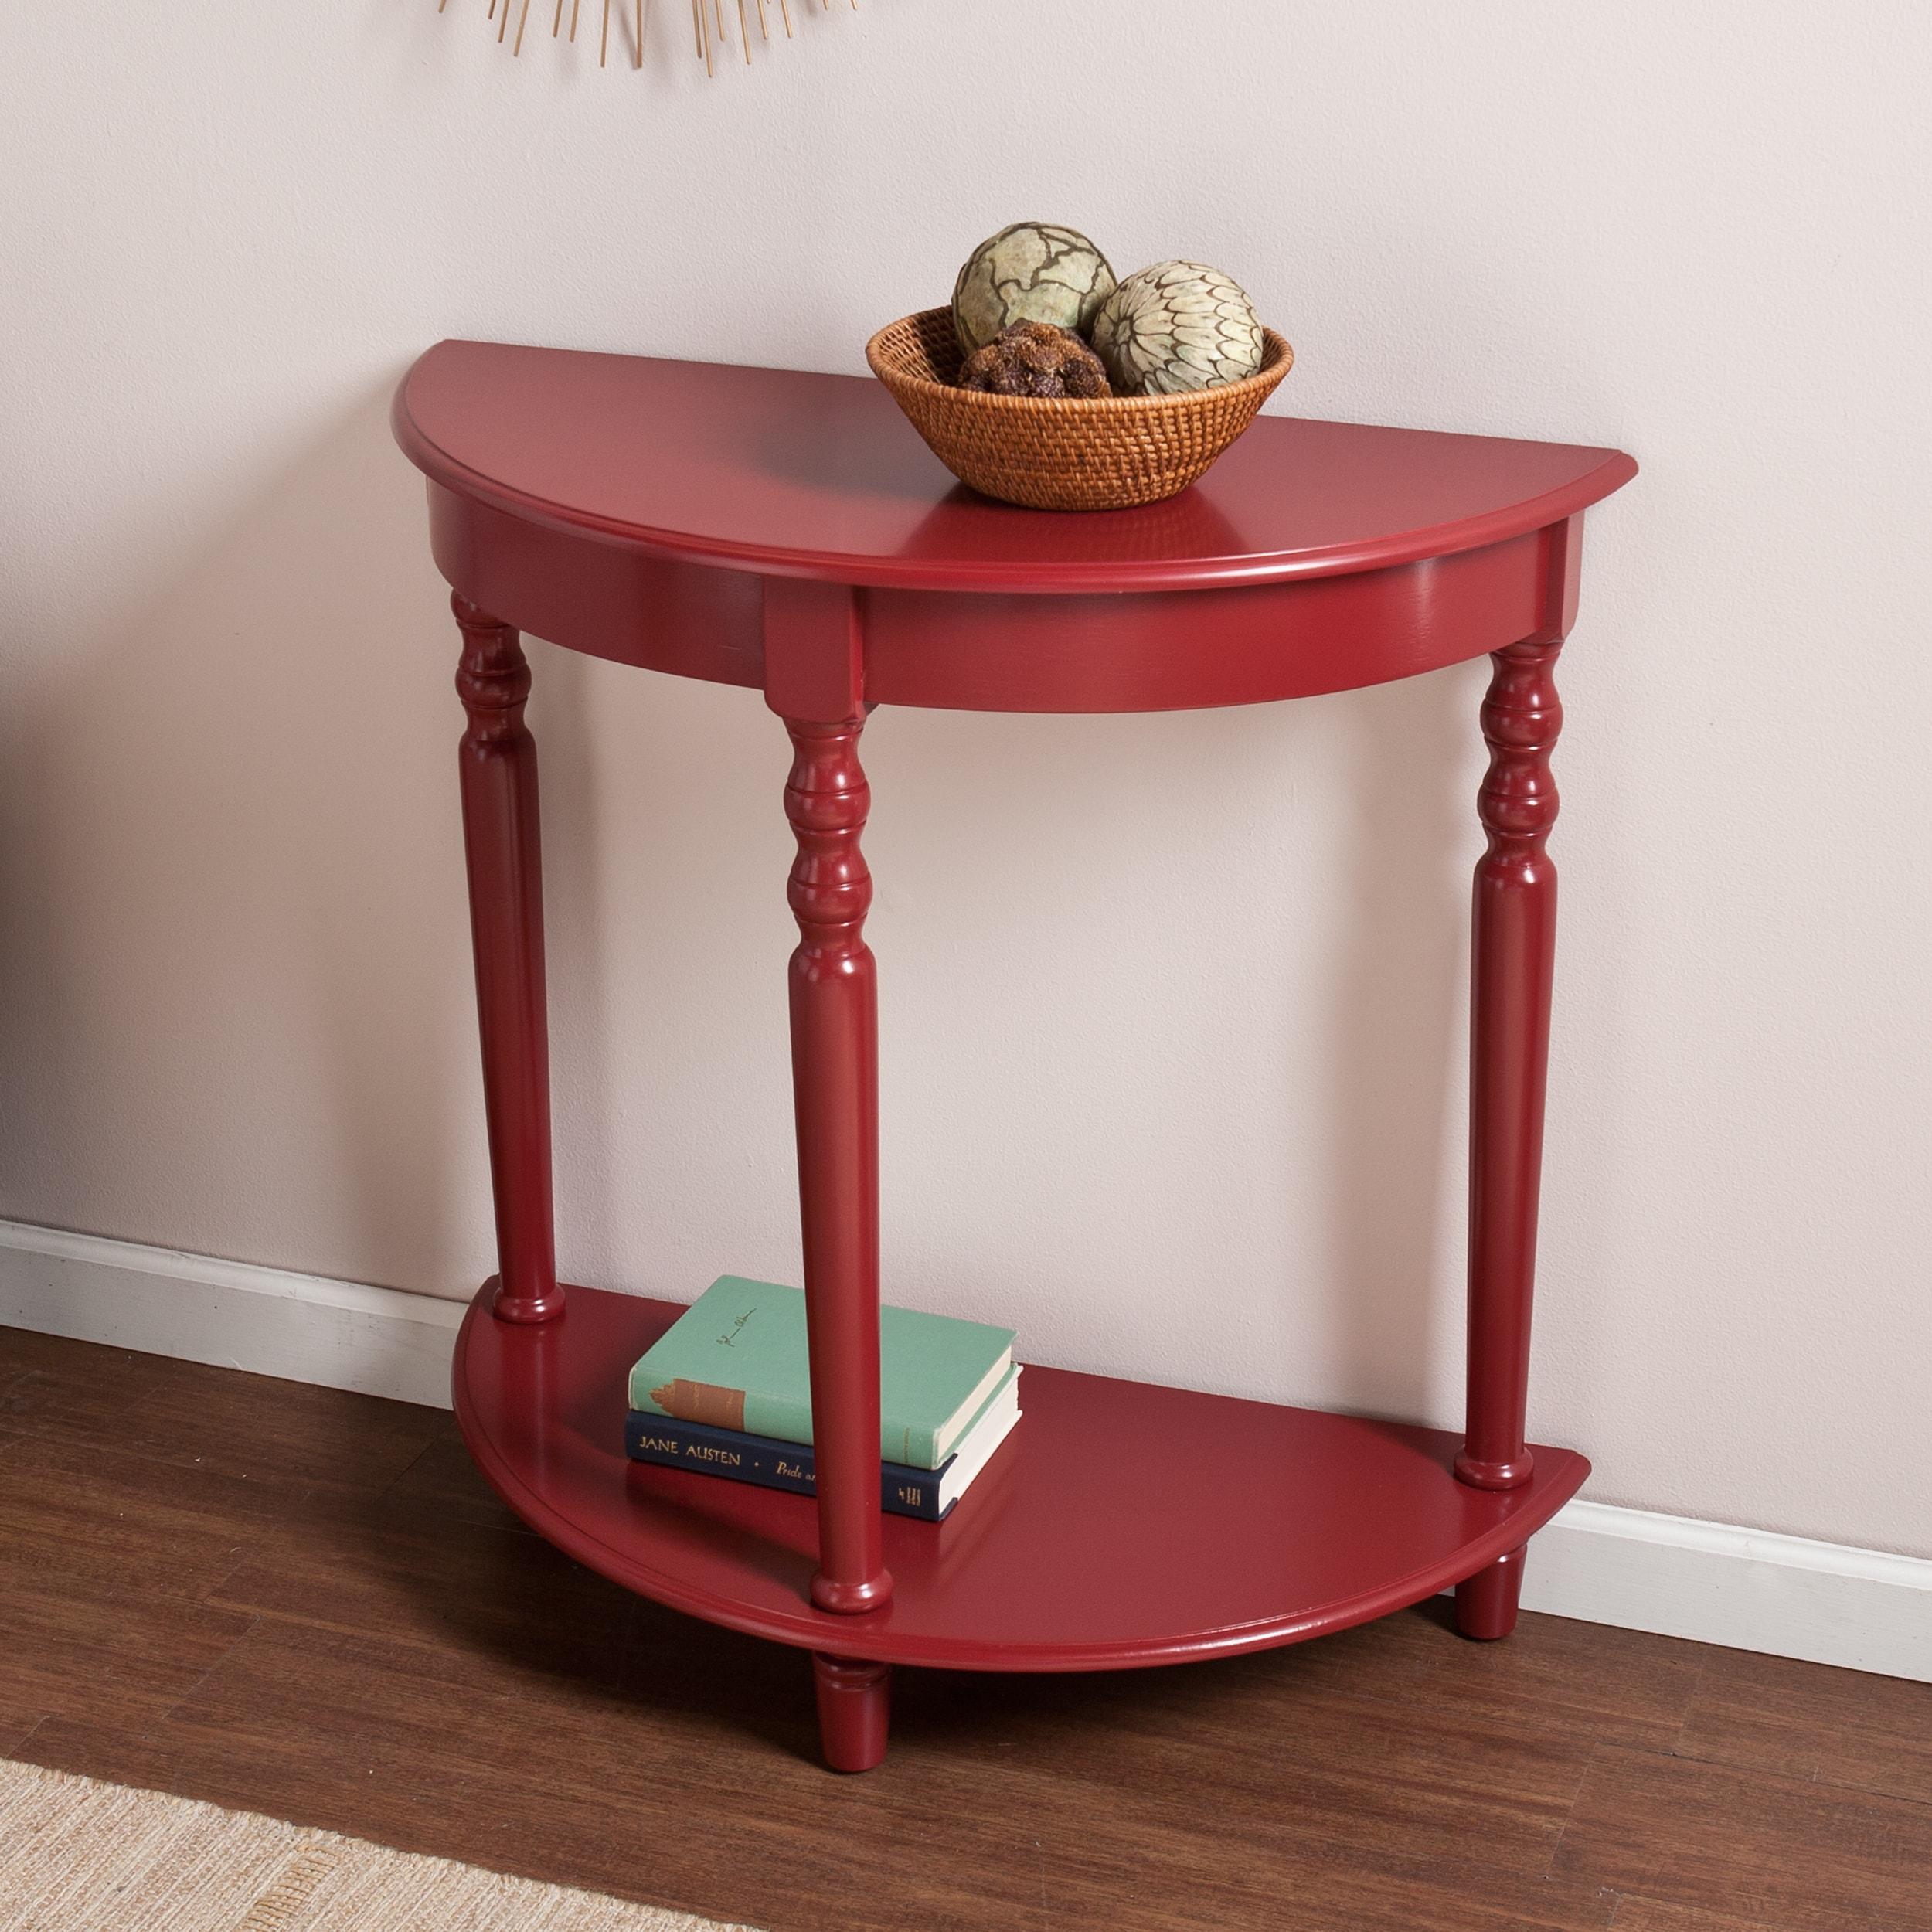 Prime Buy Red Sofa Tables Online At Overstock Our Best Living Short Links Chair Design For Home Short Linksinfo